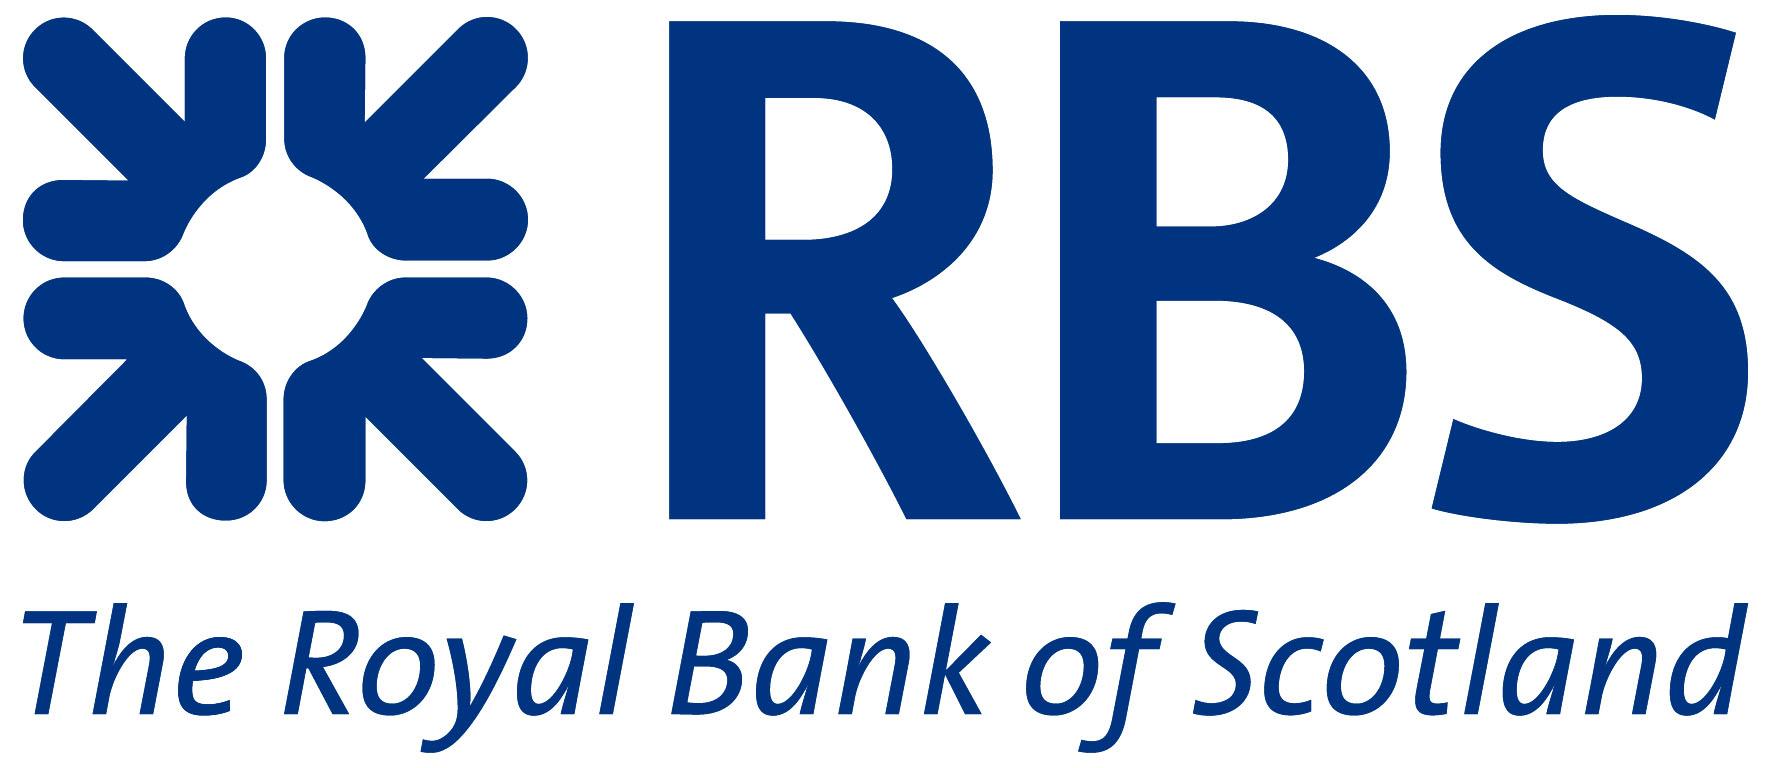 The Royal Bank of Scotland